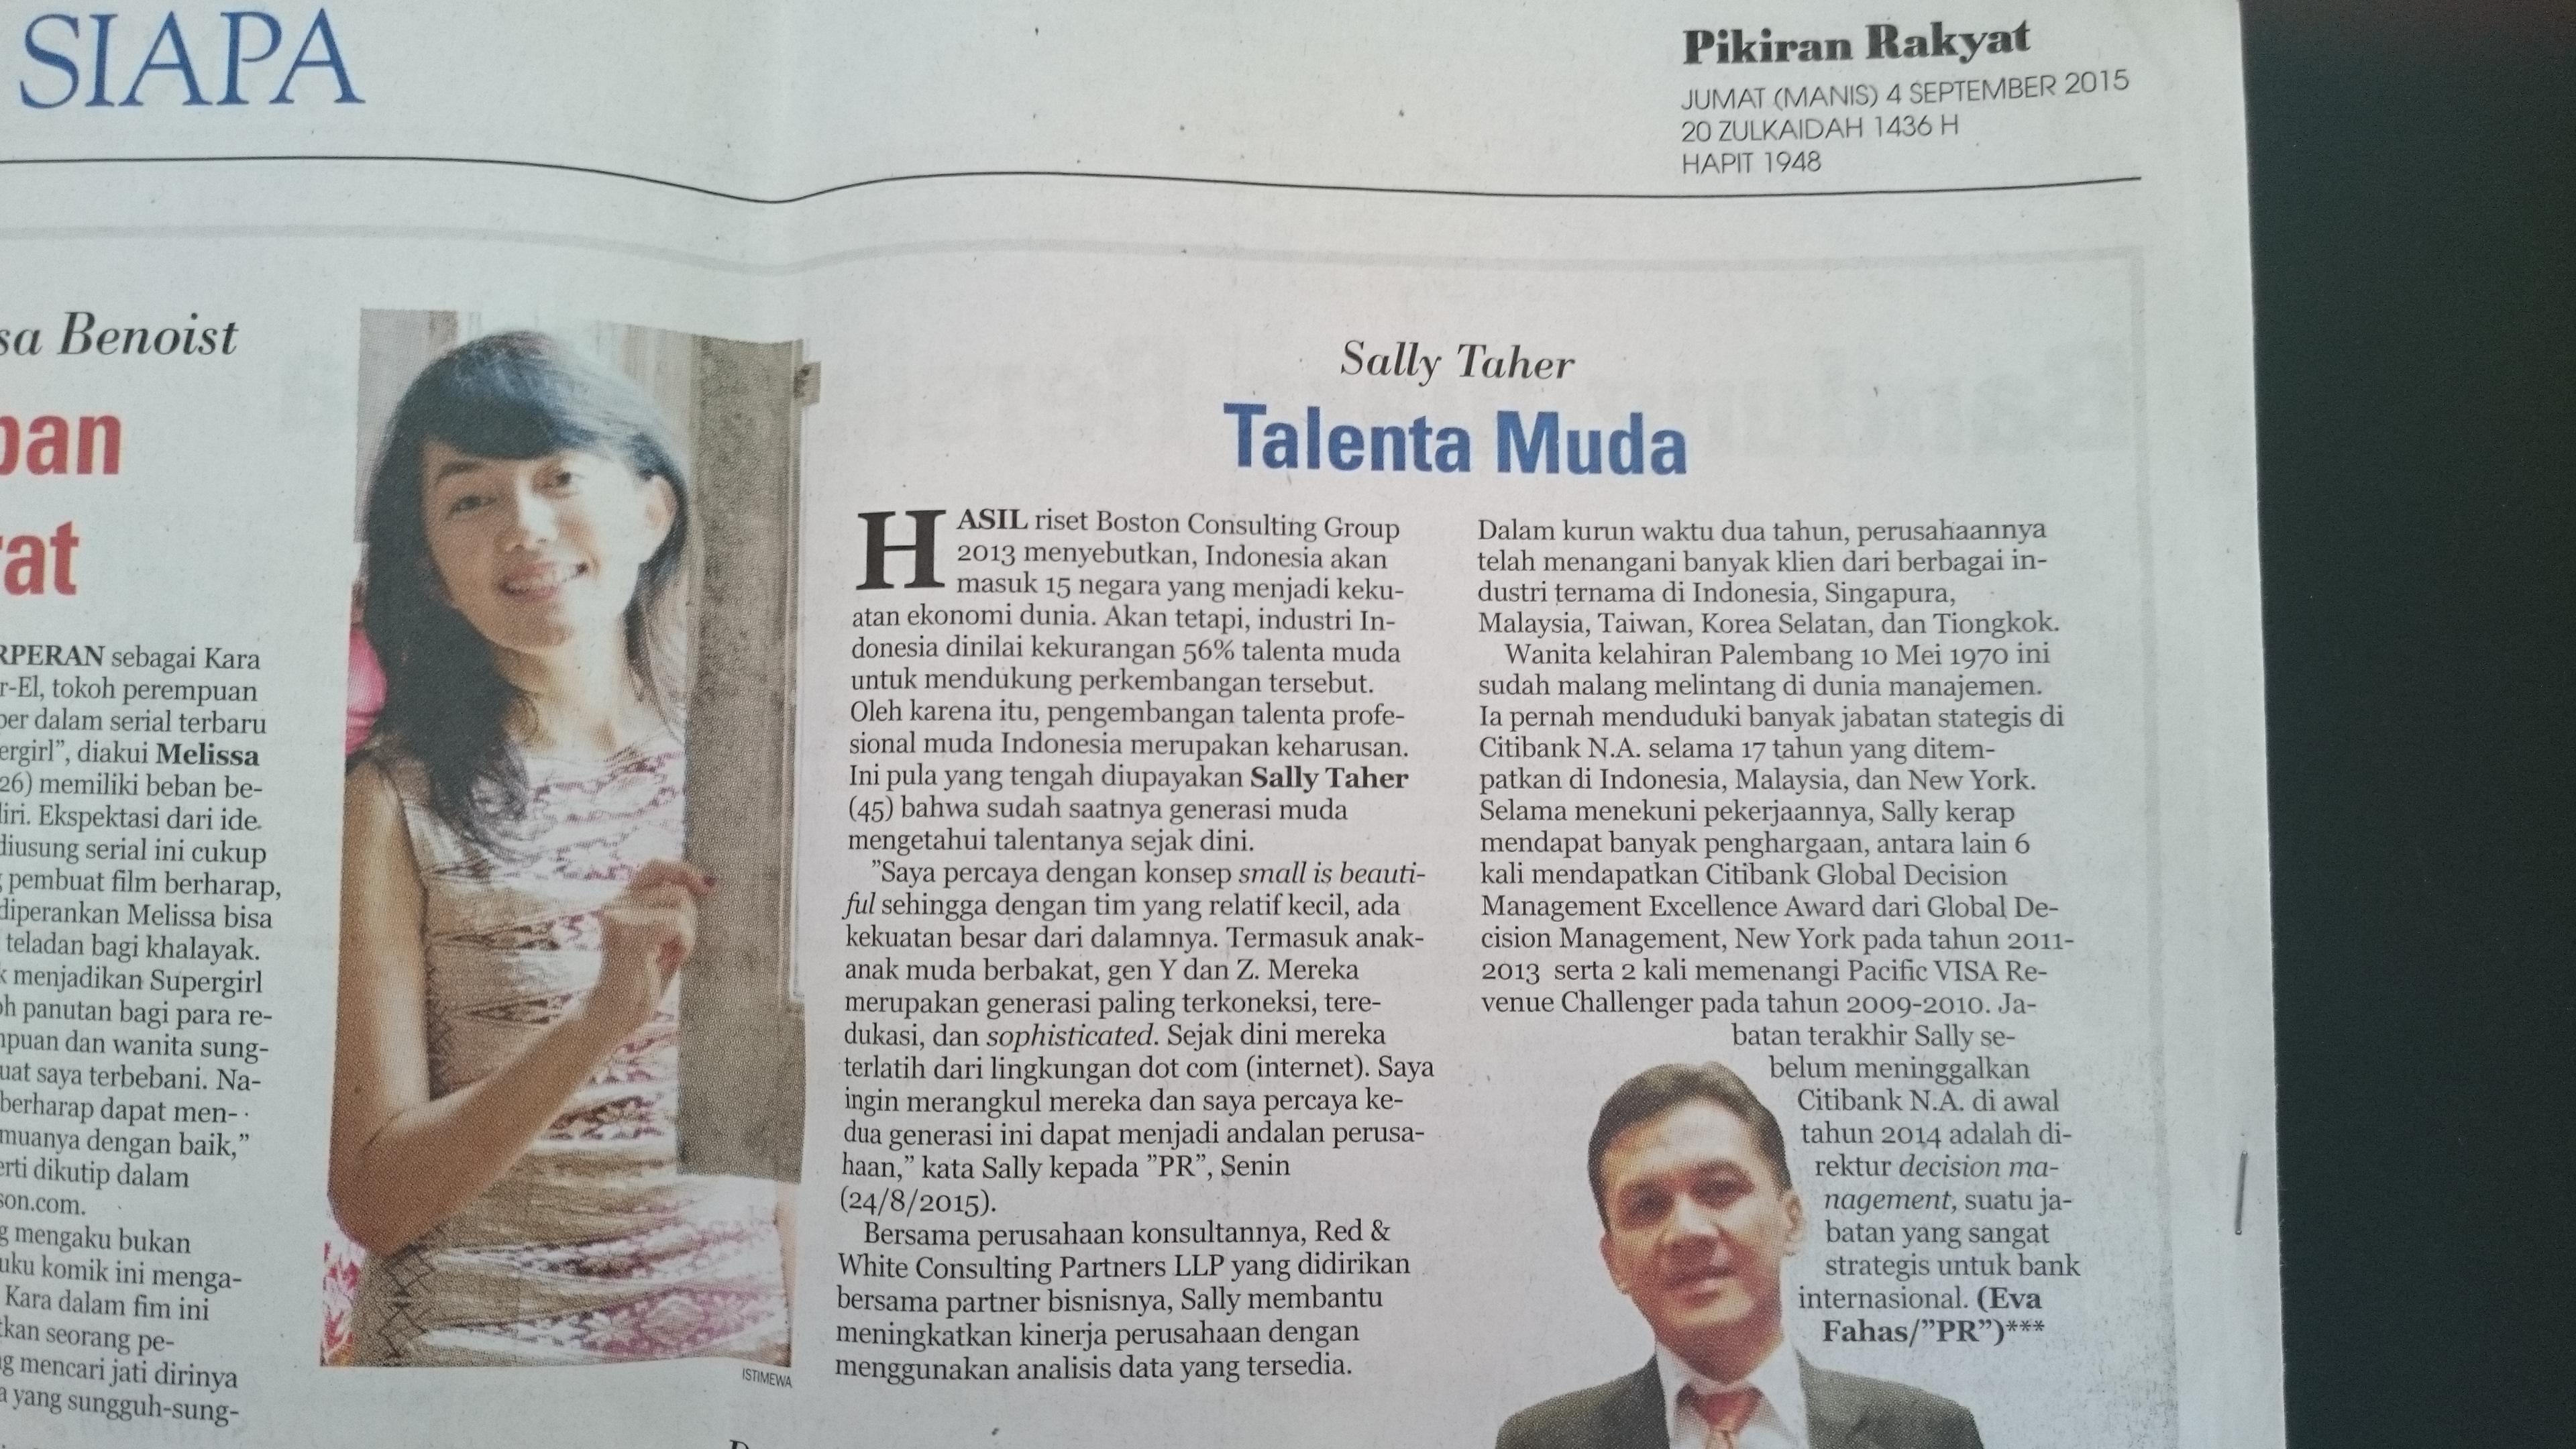 Founder Story at Pikiran Rakyat